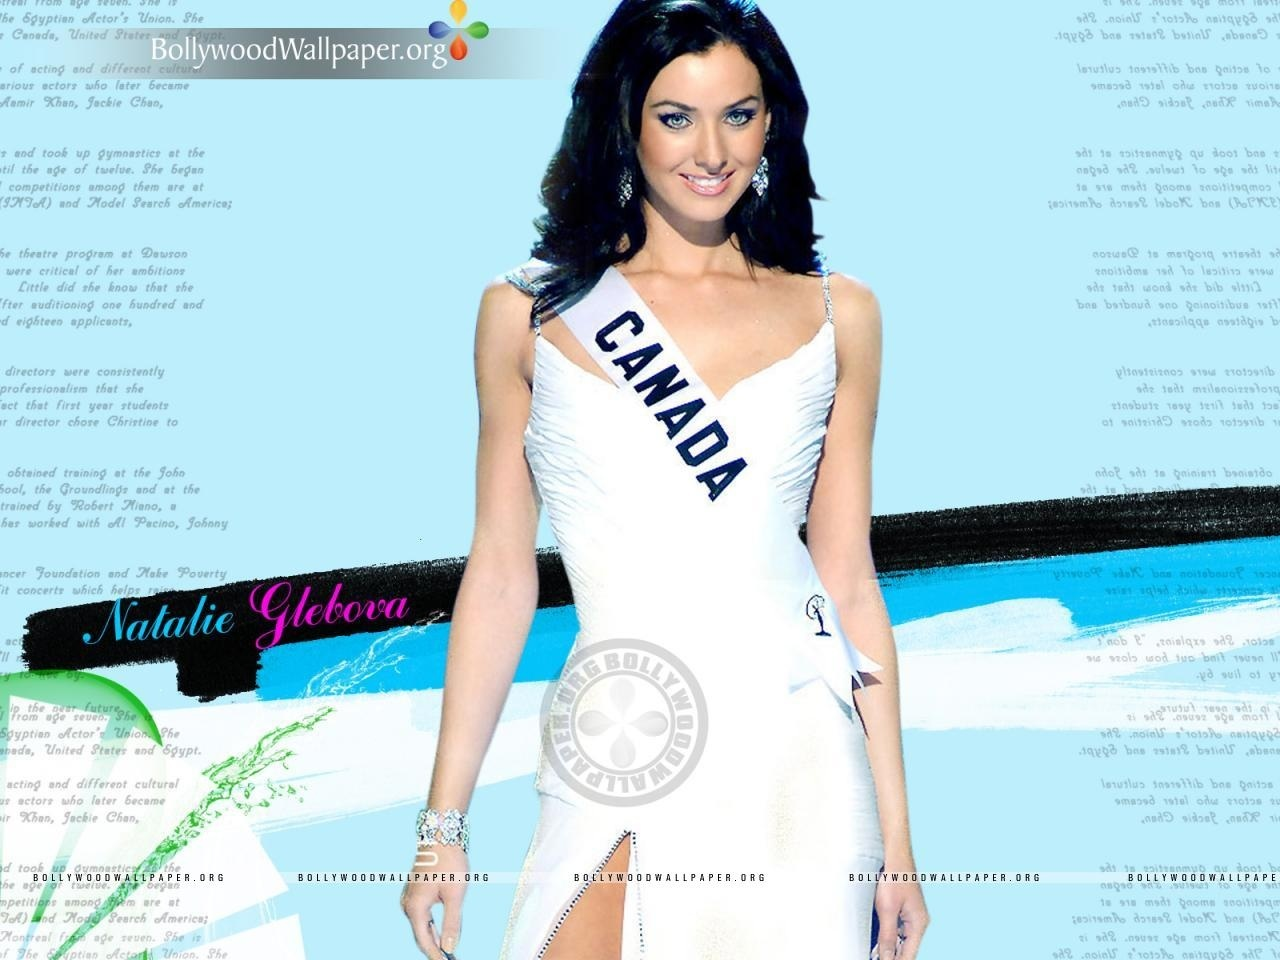 natalie glebova, miss universe 2005. - Página 3 Natali13